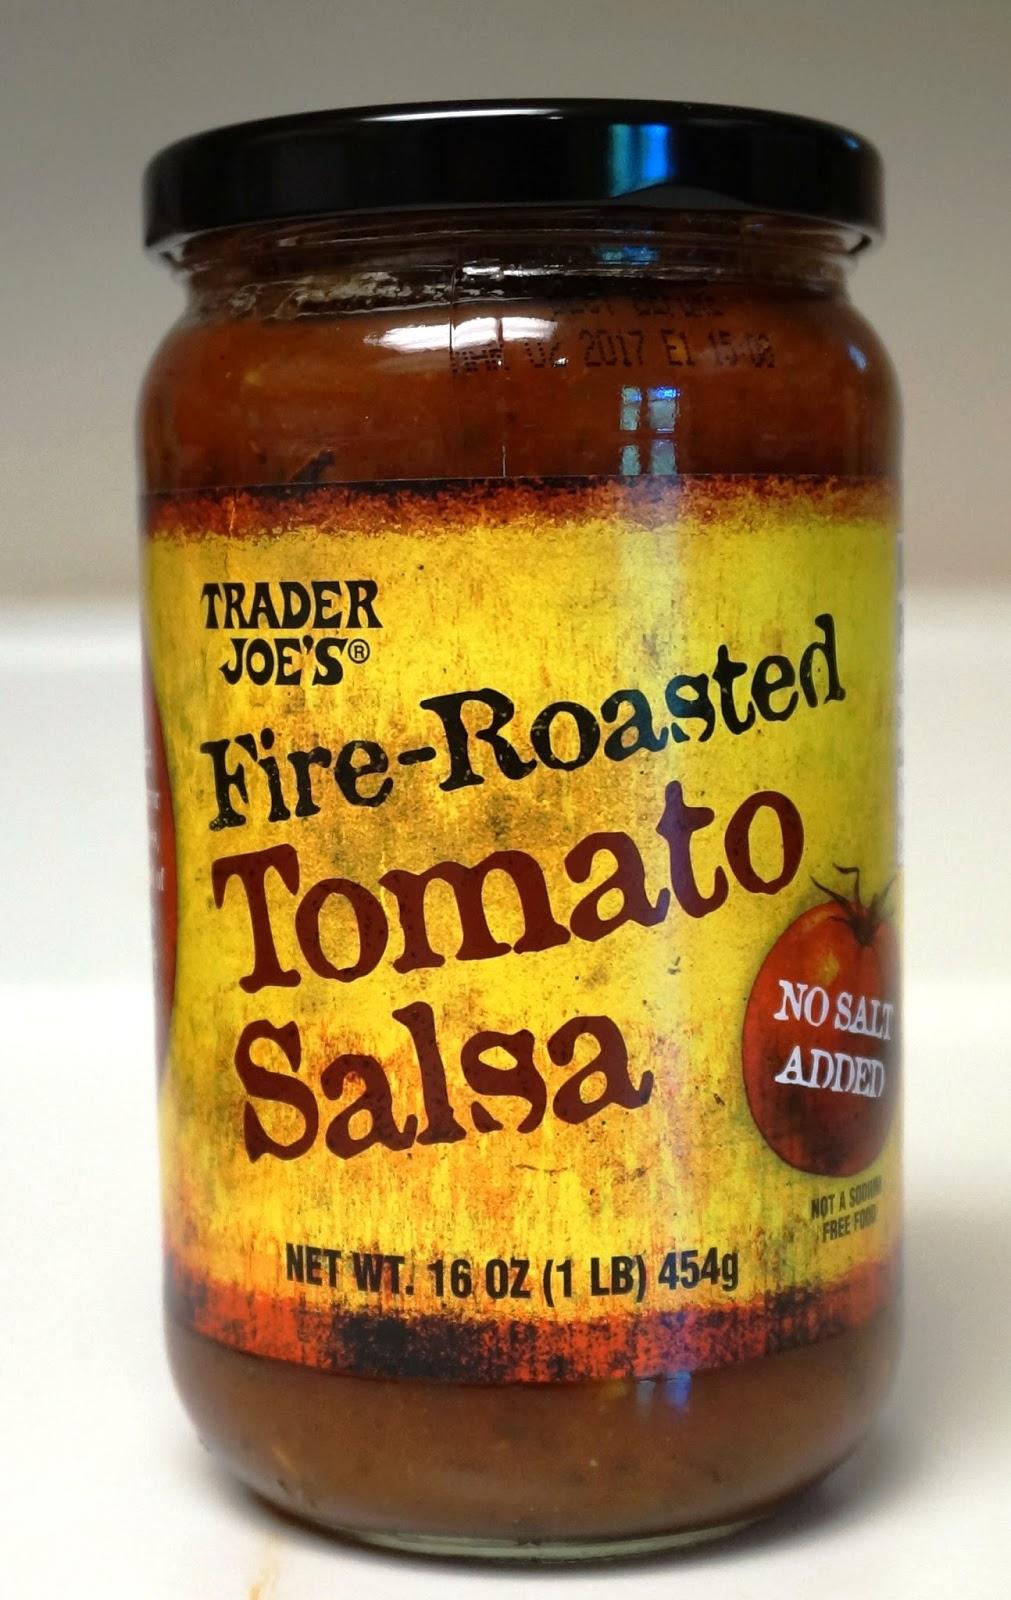 Exploring trader joe 39 s trader joe 39 s fire roasted tomato salsa for Trader joe s fish